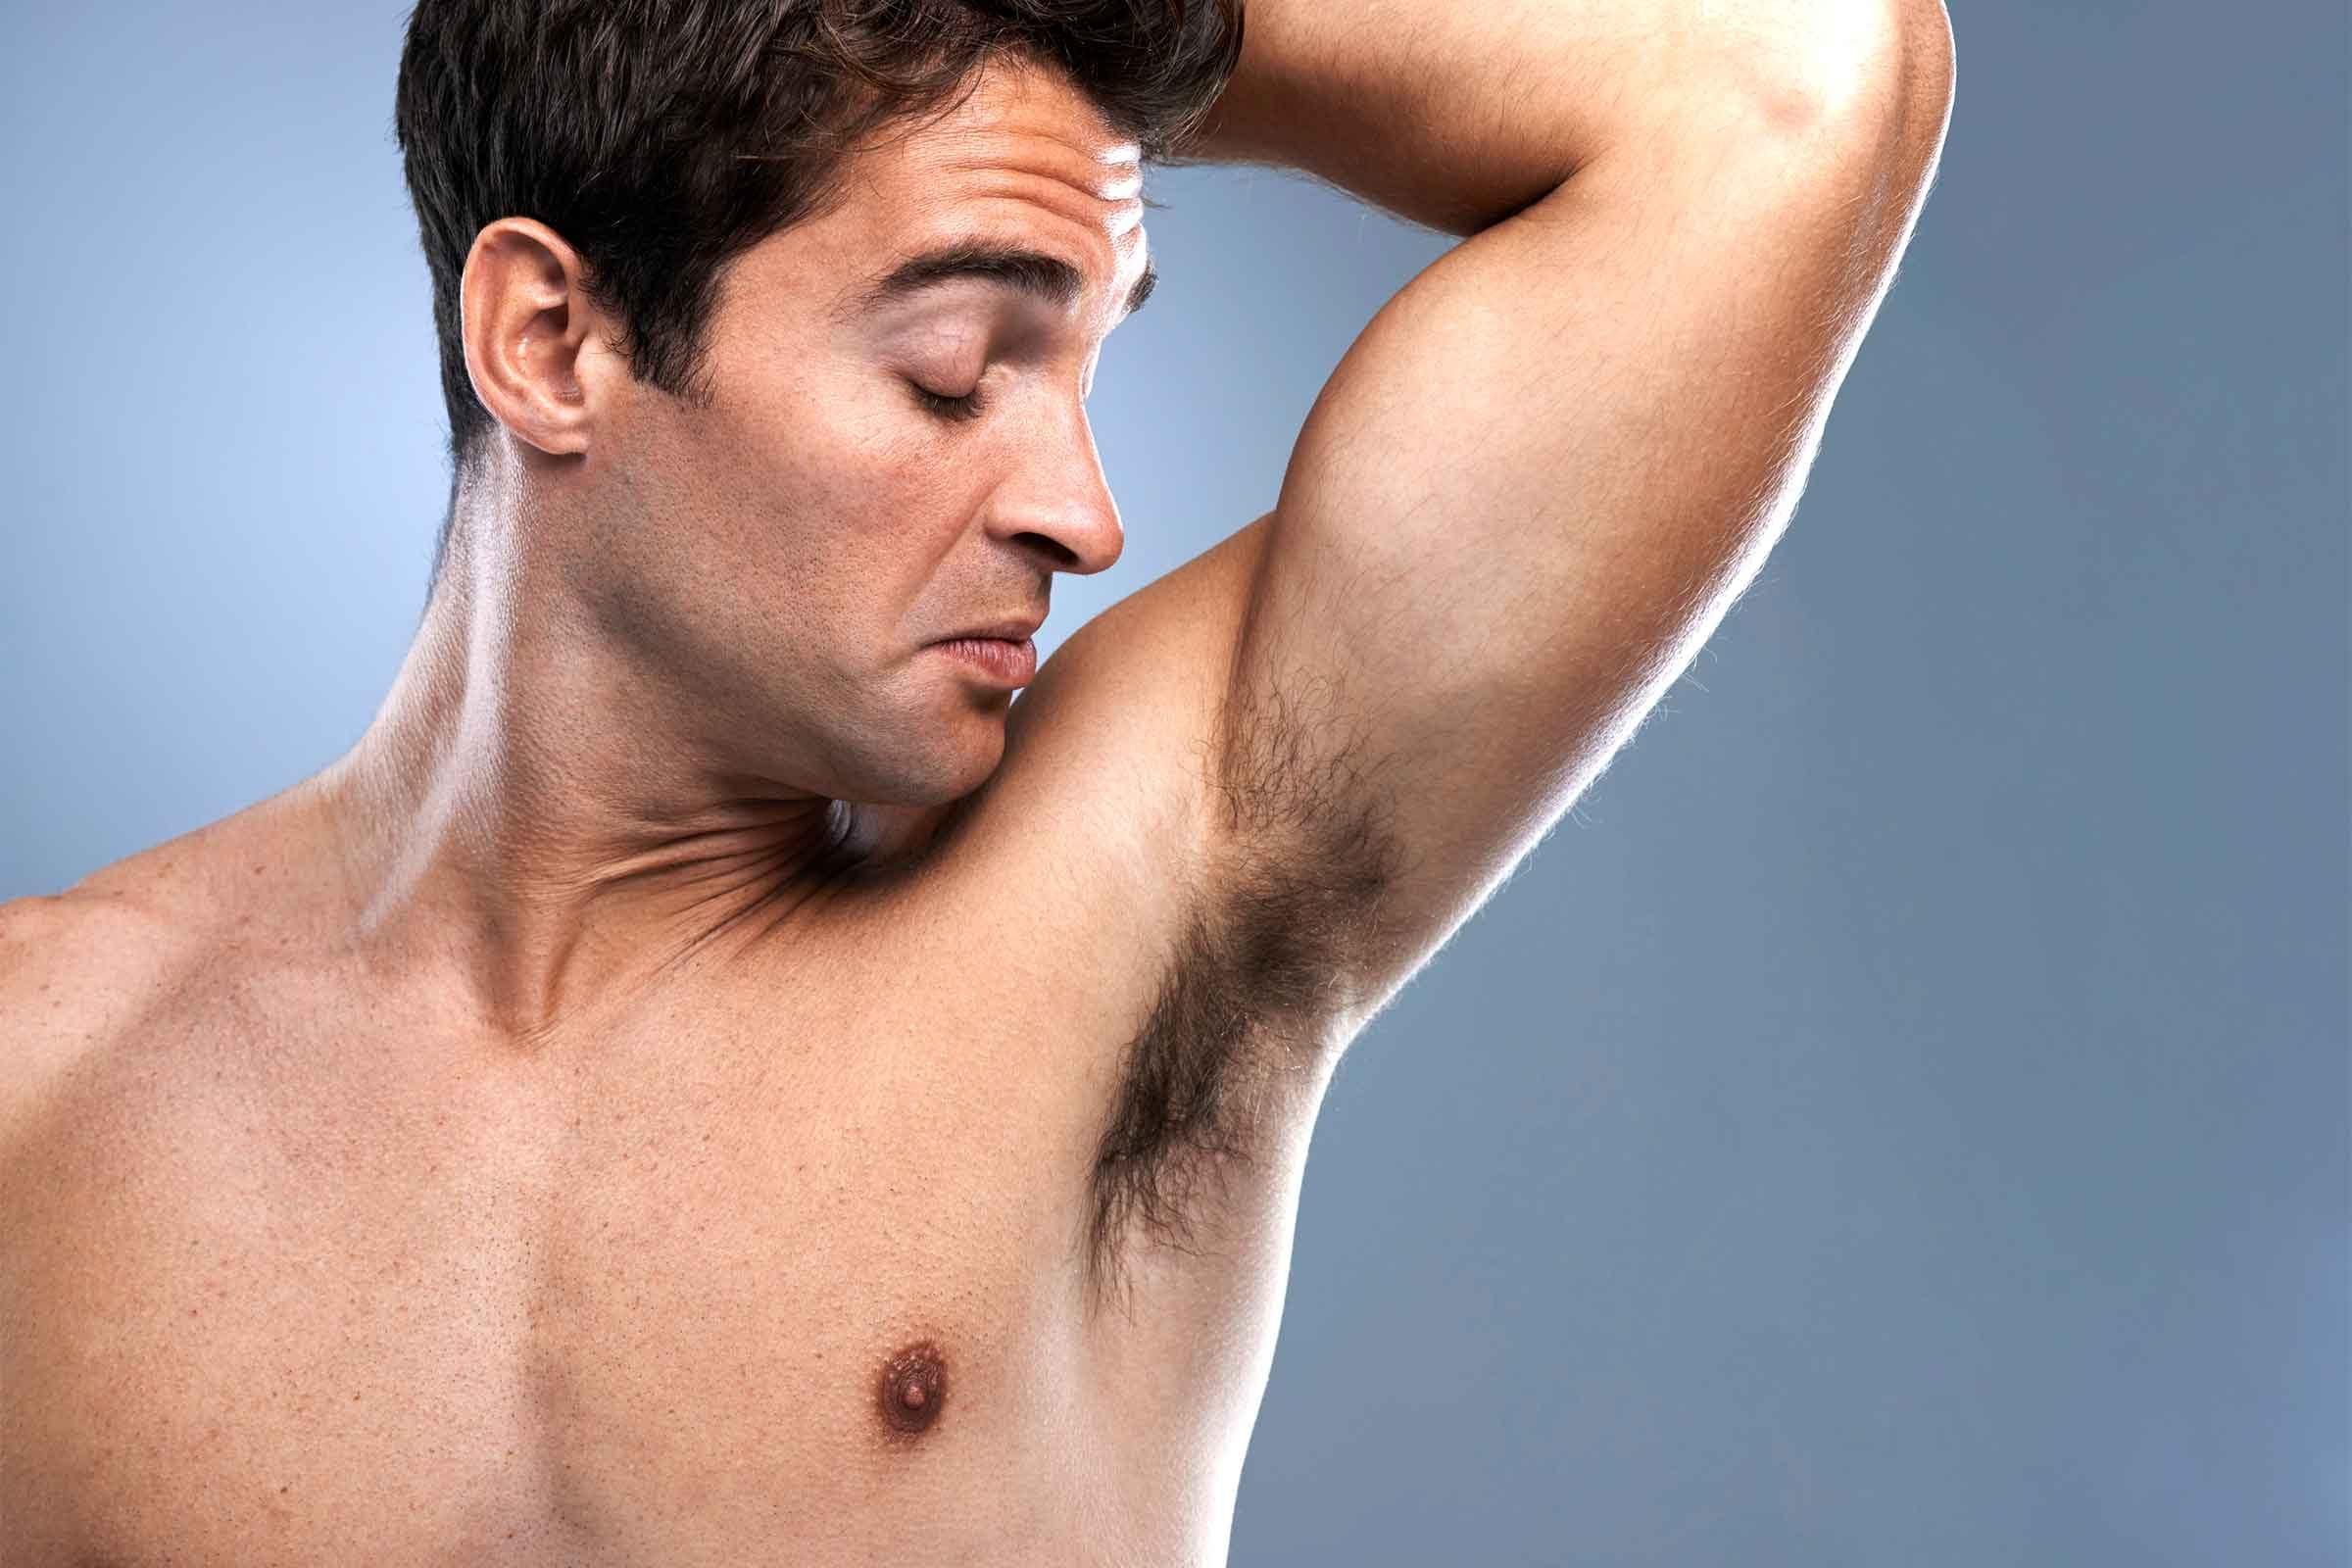 Male Grooming: Hygiene Habits for Men | Reader's Digest